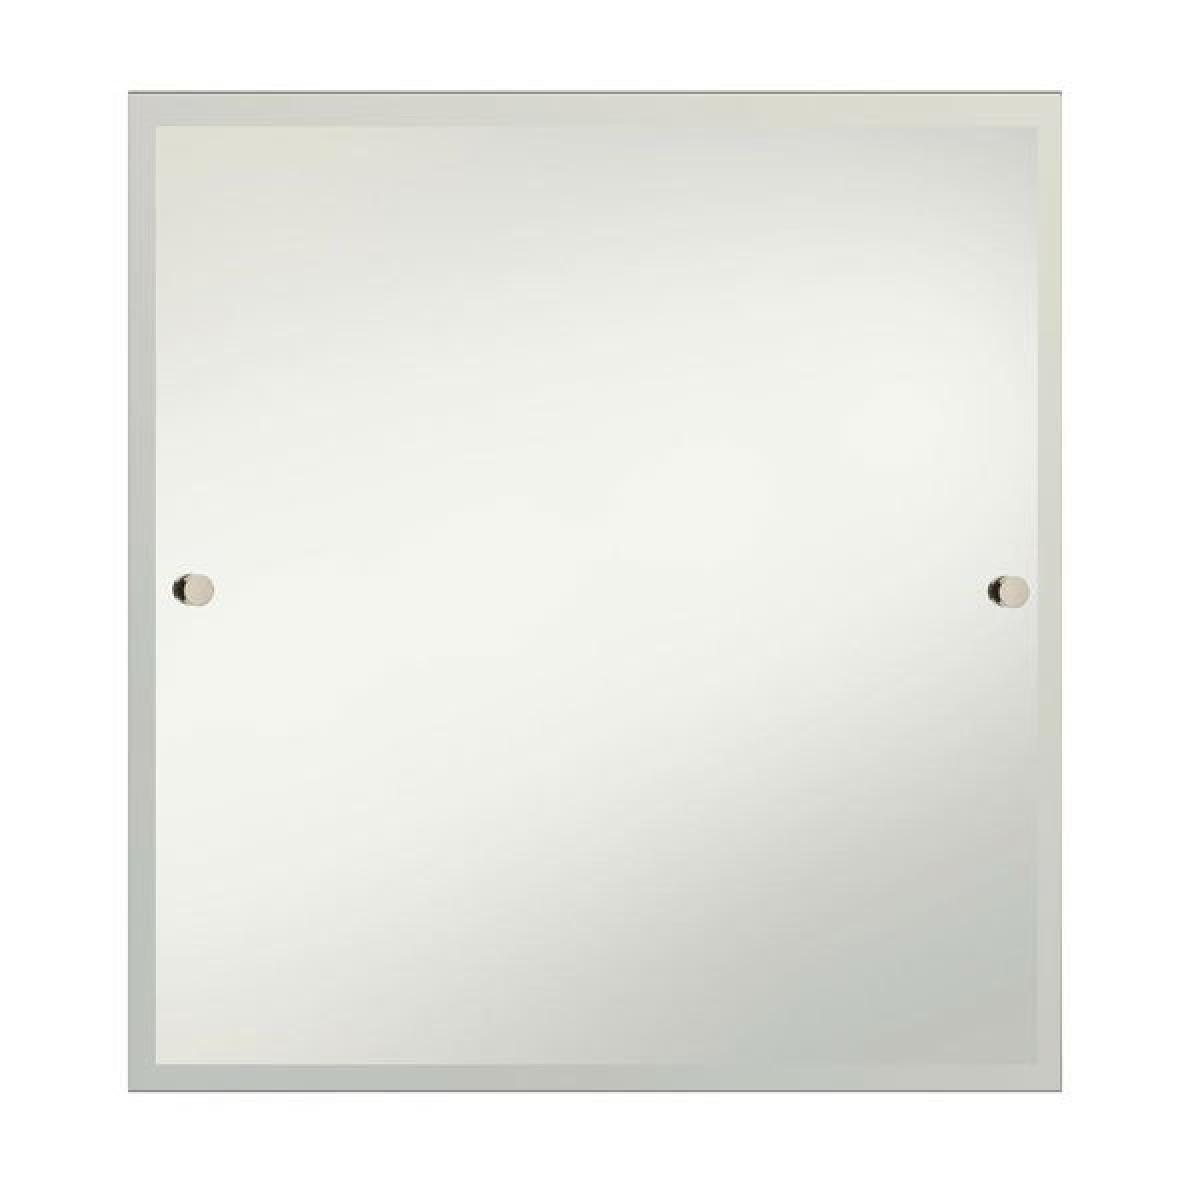 Bristan square bathroom mirror 600mm x 600mm gold for Mirror 600 x 600